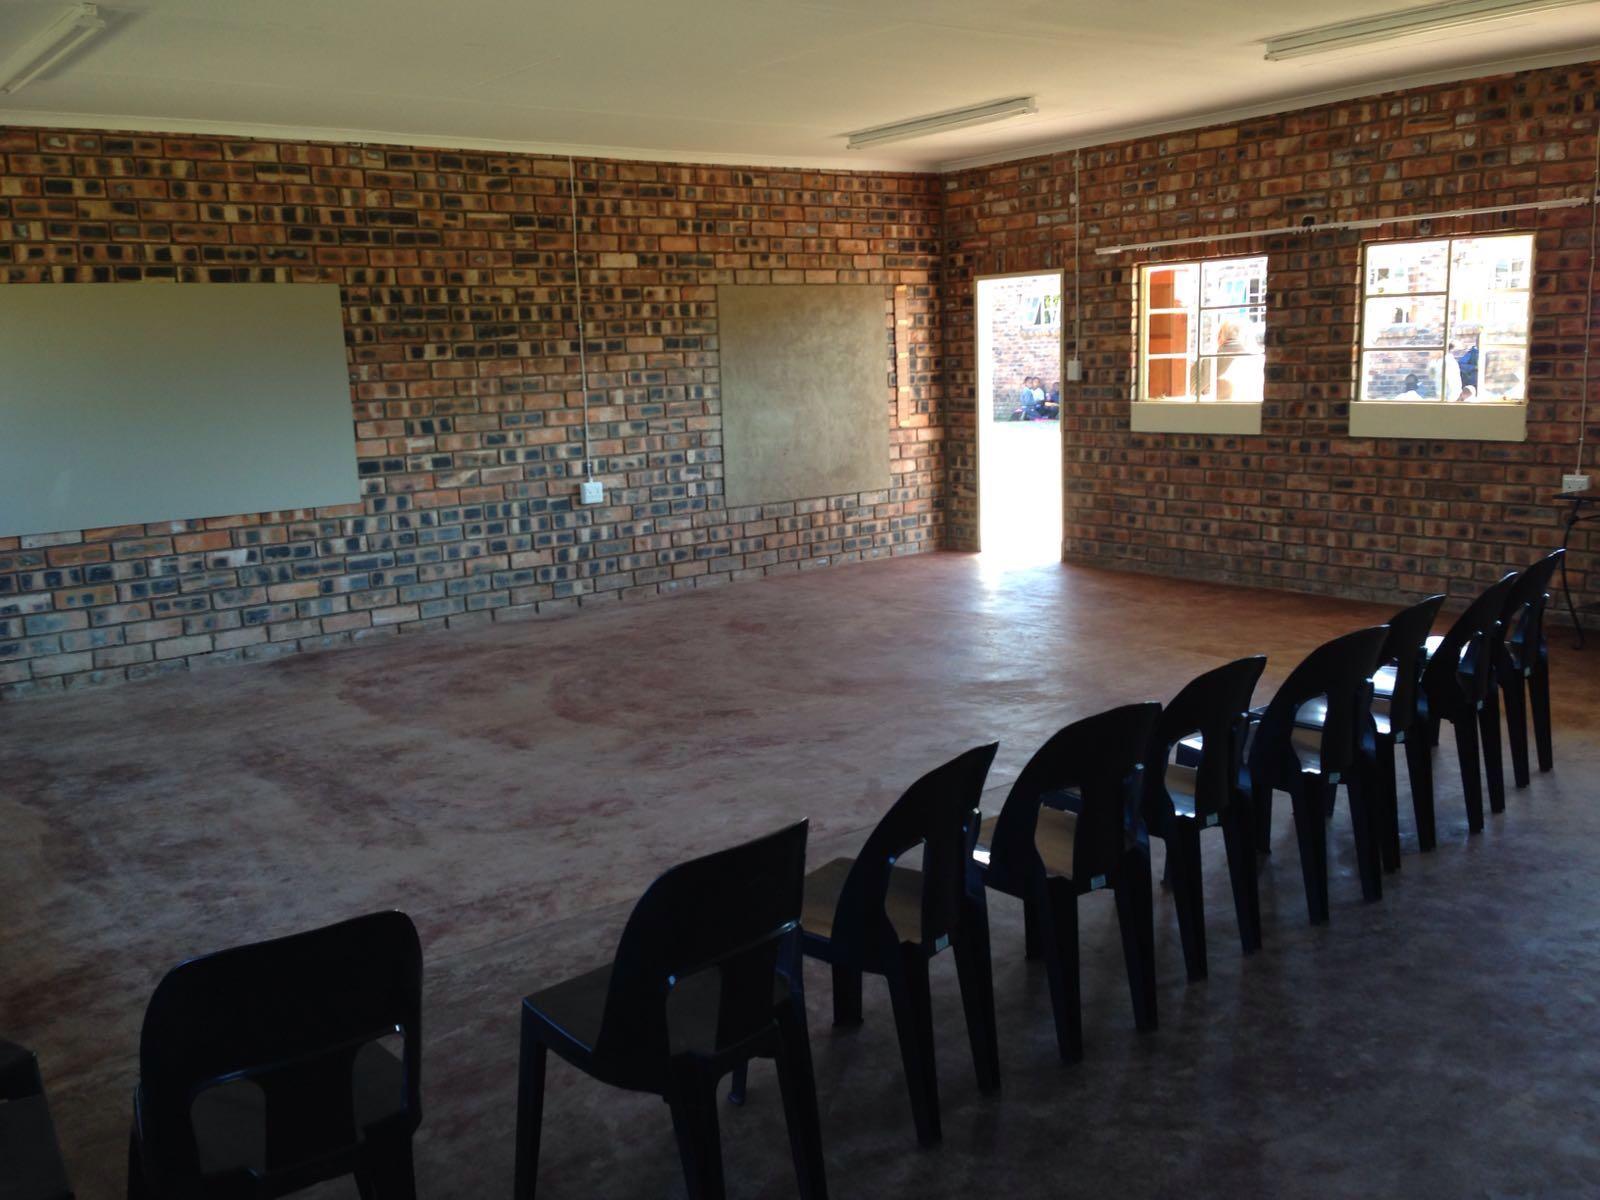 Good news from Tshega Christian Missions